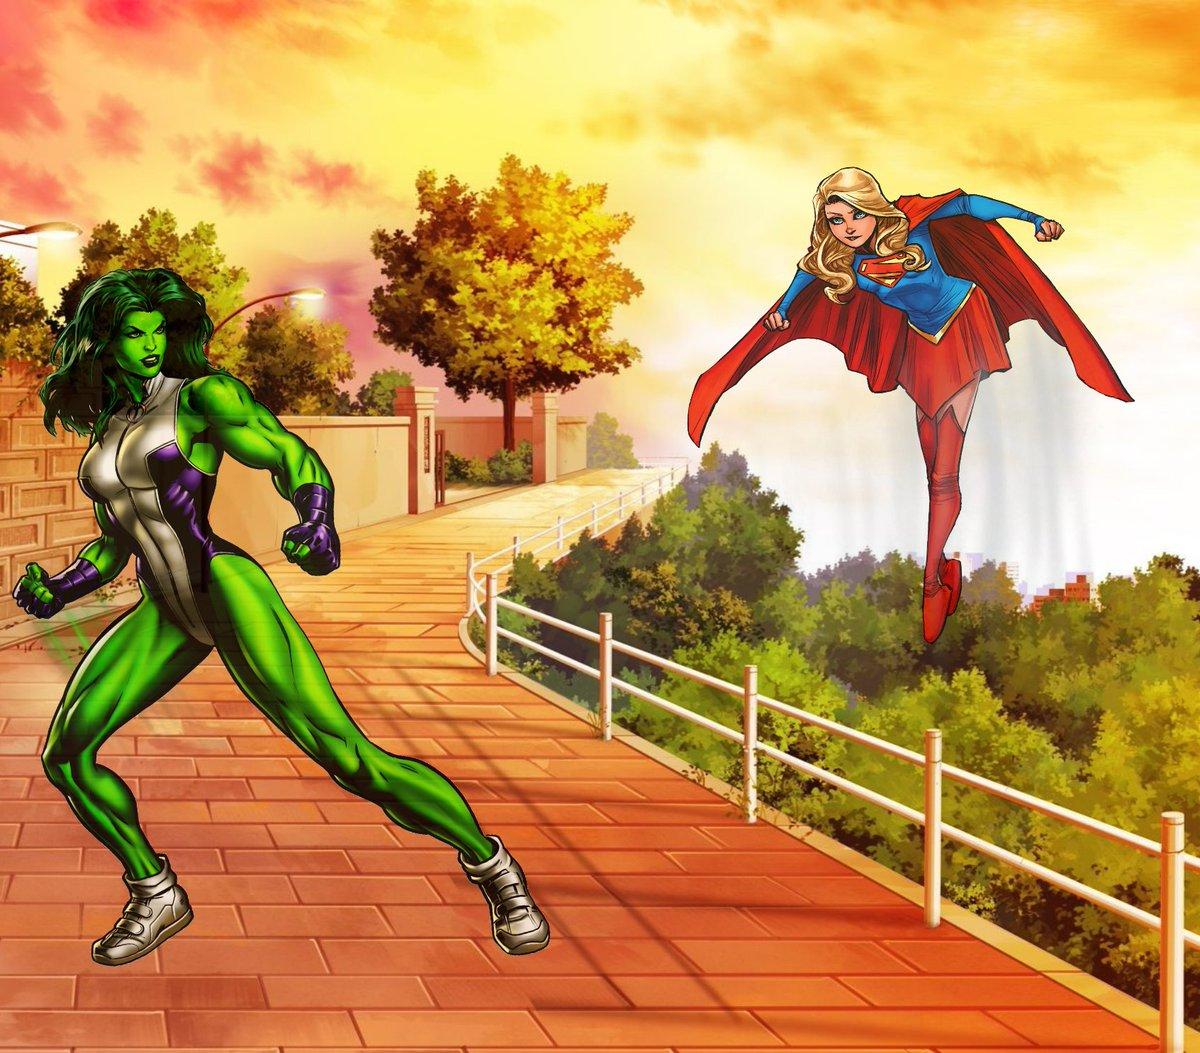 She-Hulk vs Supergirl (Marvel vs DC) literally some heavy hitters!  @DEATHBATTLE #deathbattle #deathbattlecast #marvel #marveluniverse #MCU #DCU #dccomics #cw #SheHulk #Supergirlpic.twitter.com/uBxKwjnHcm